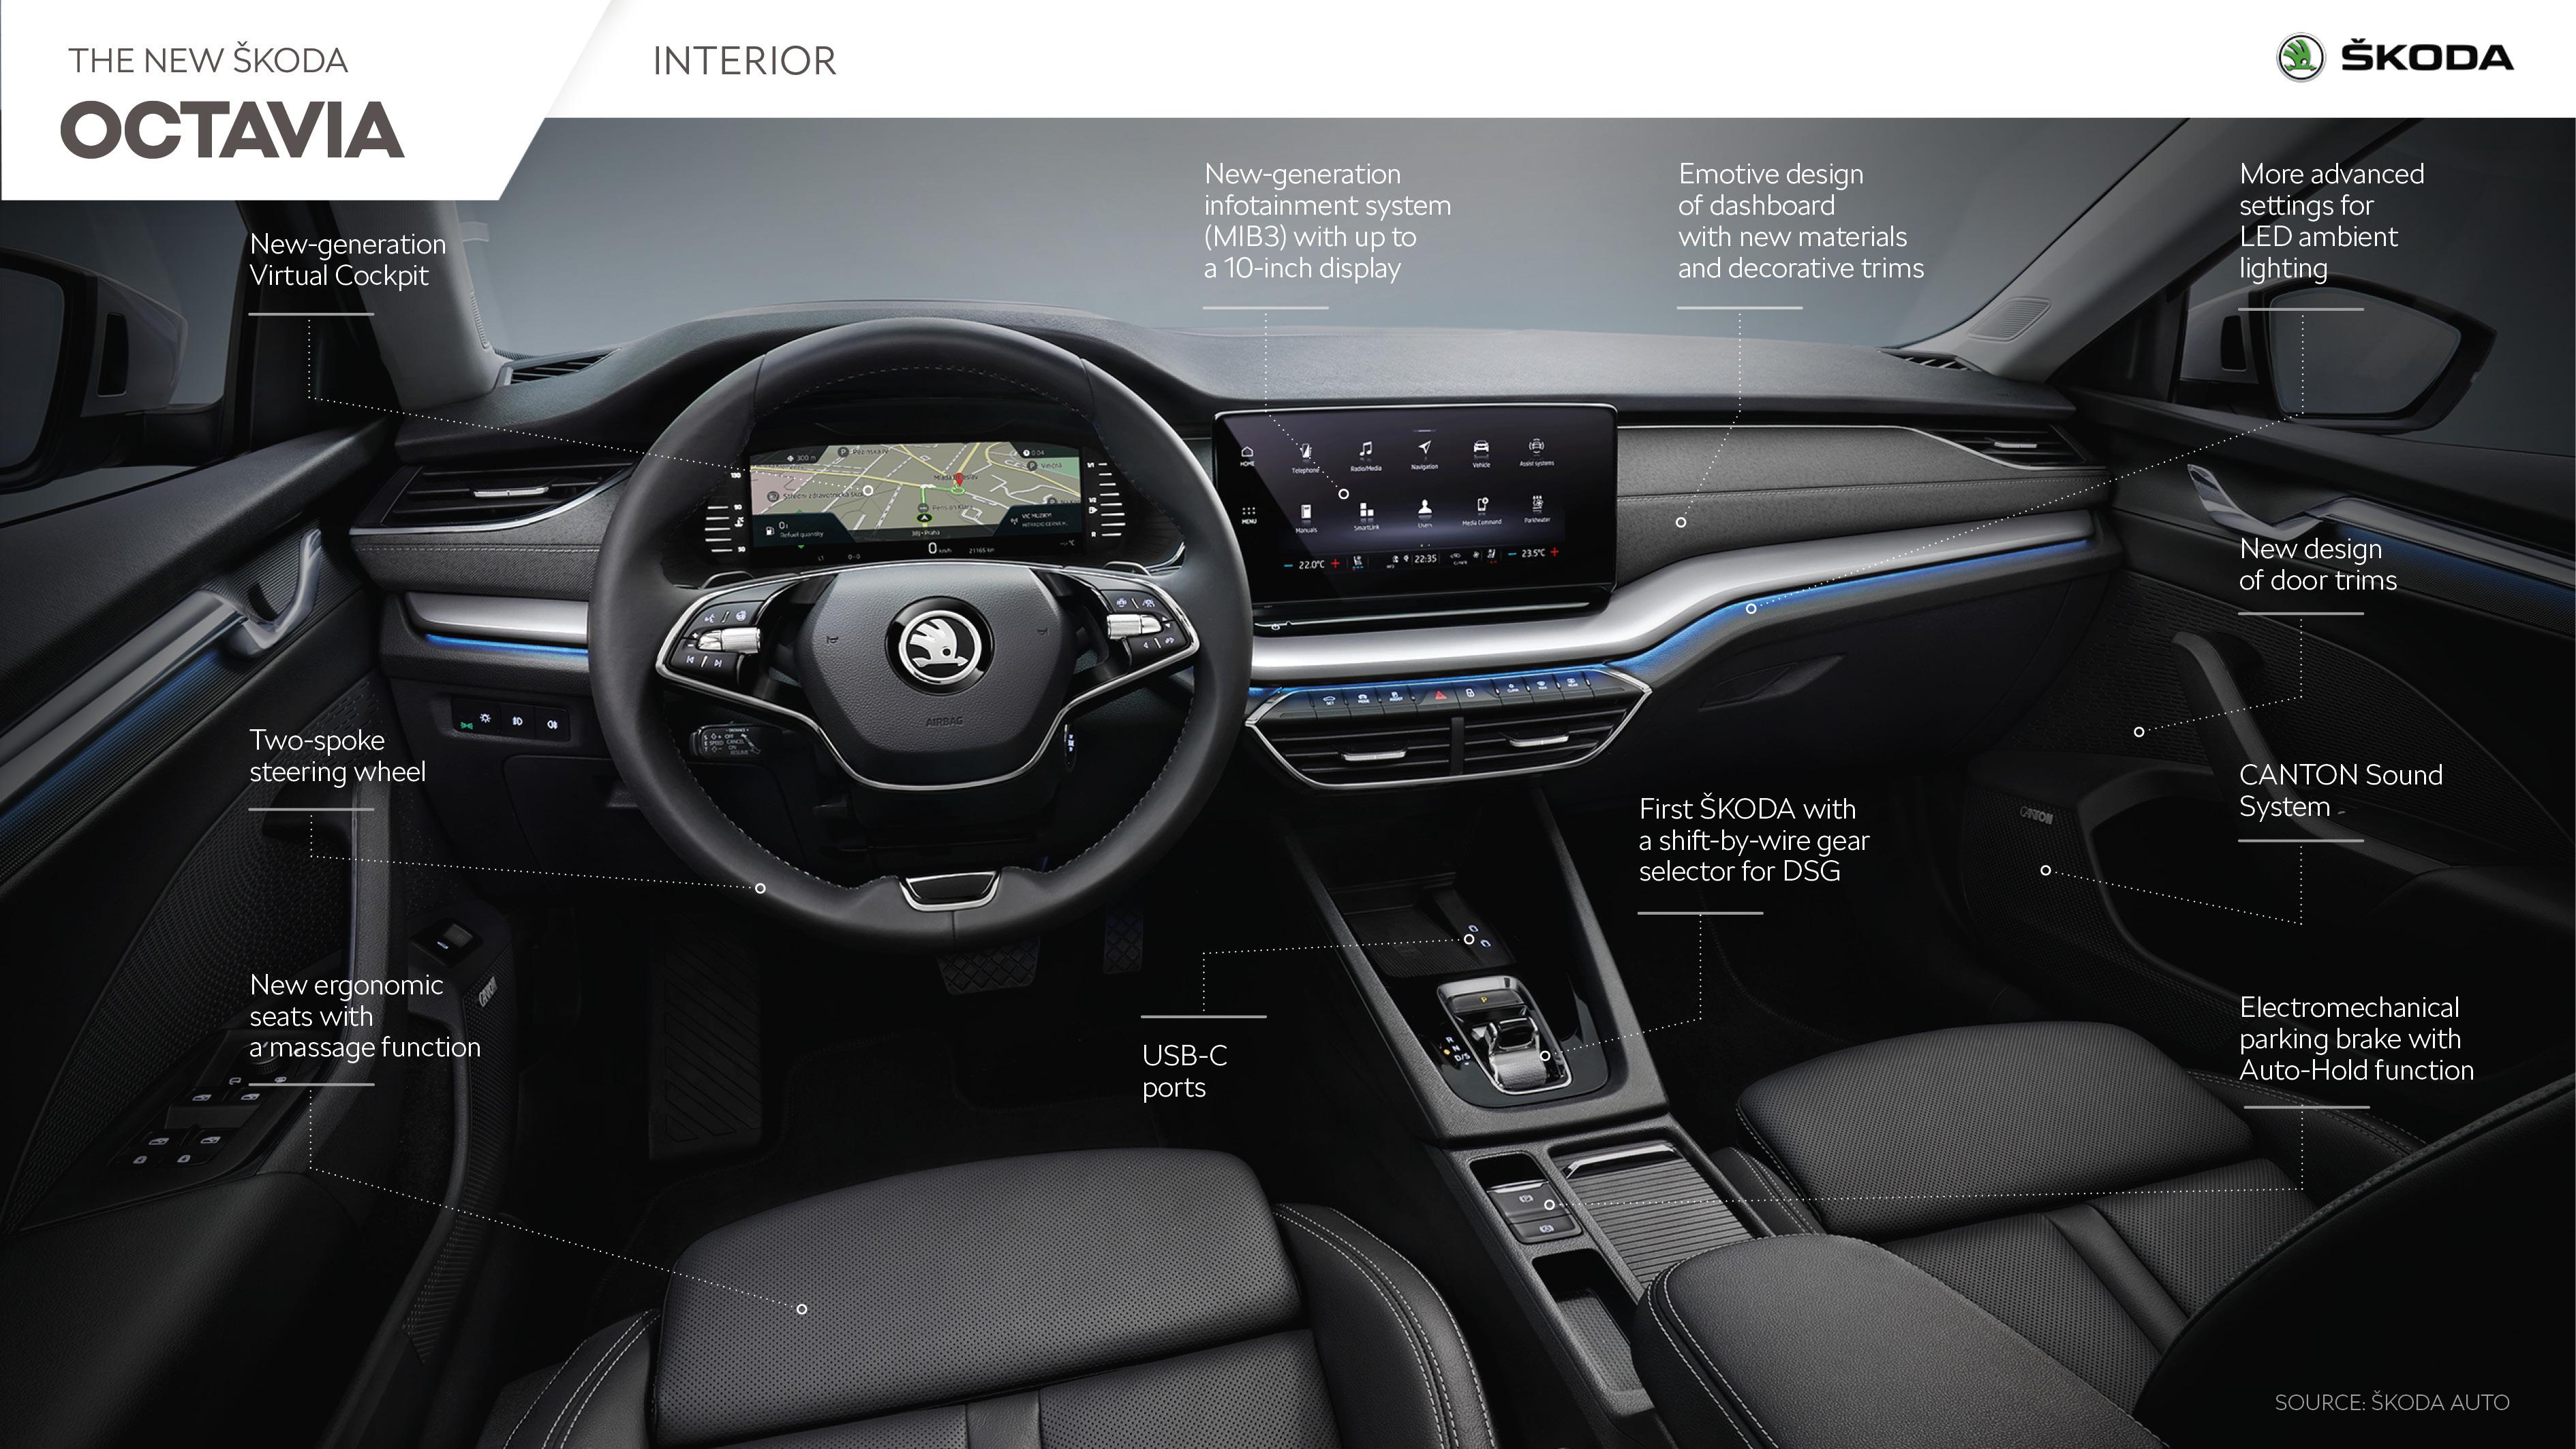 Interior New Design Improves Ergonomics And Appearance škoda Storyboard